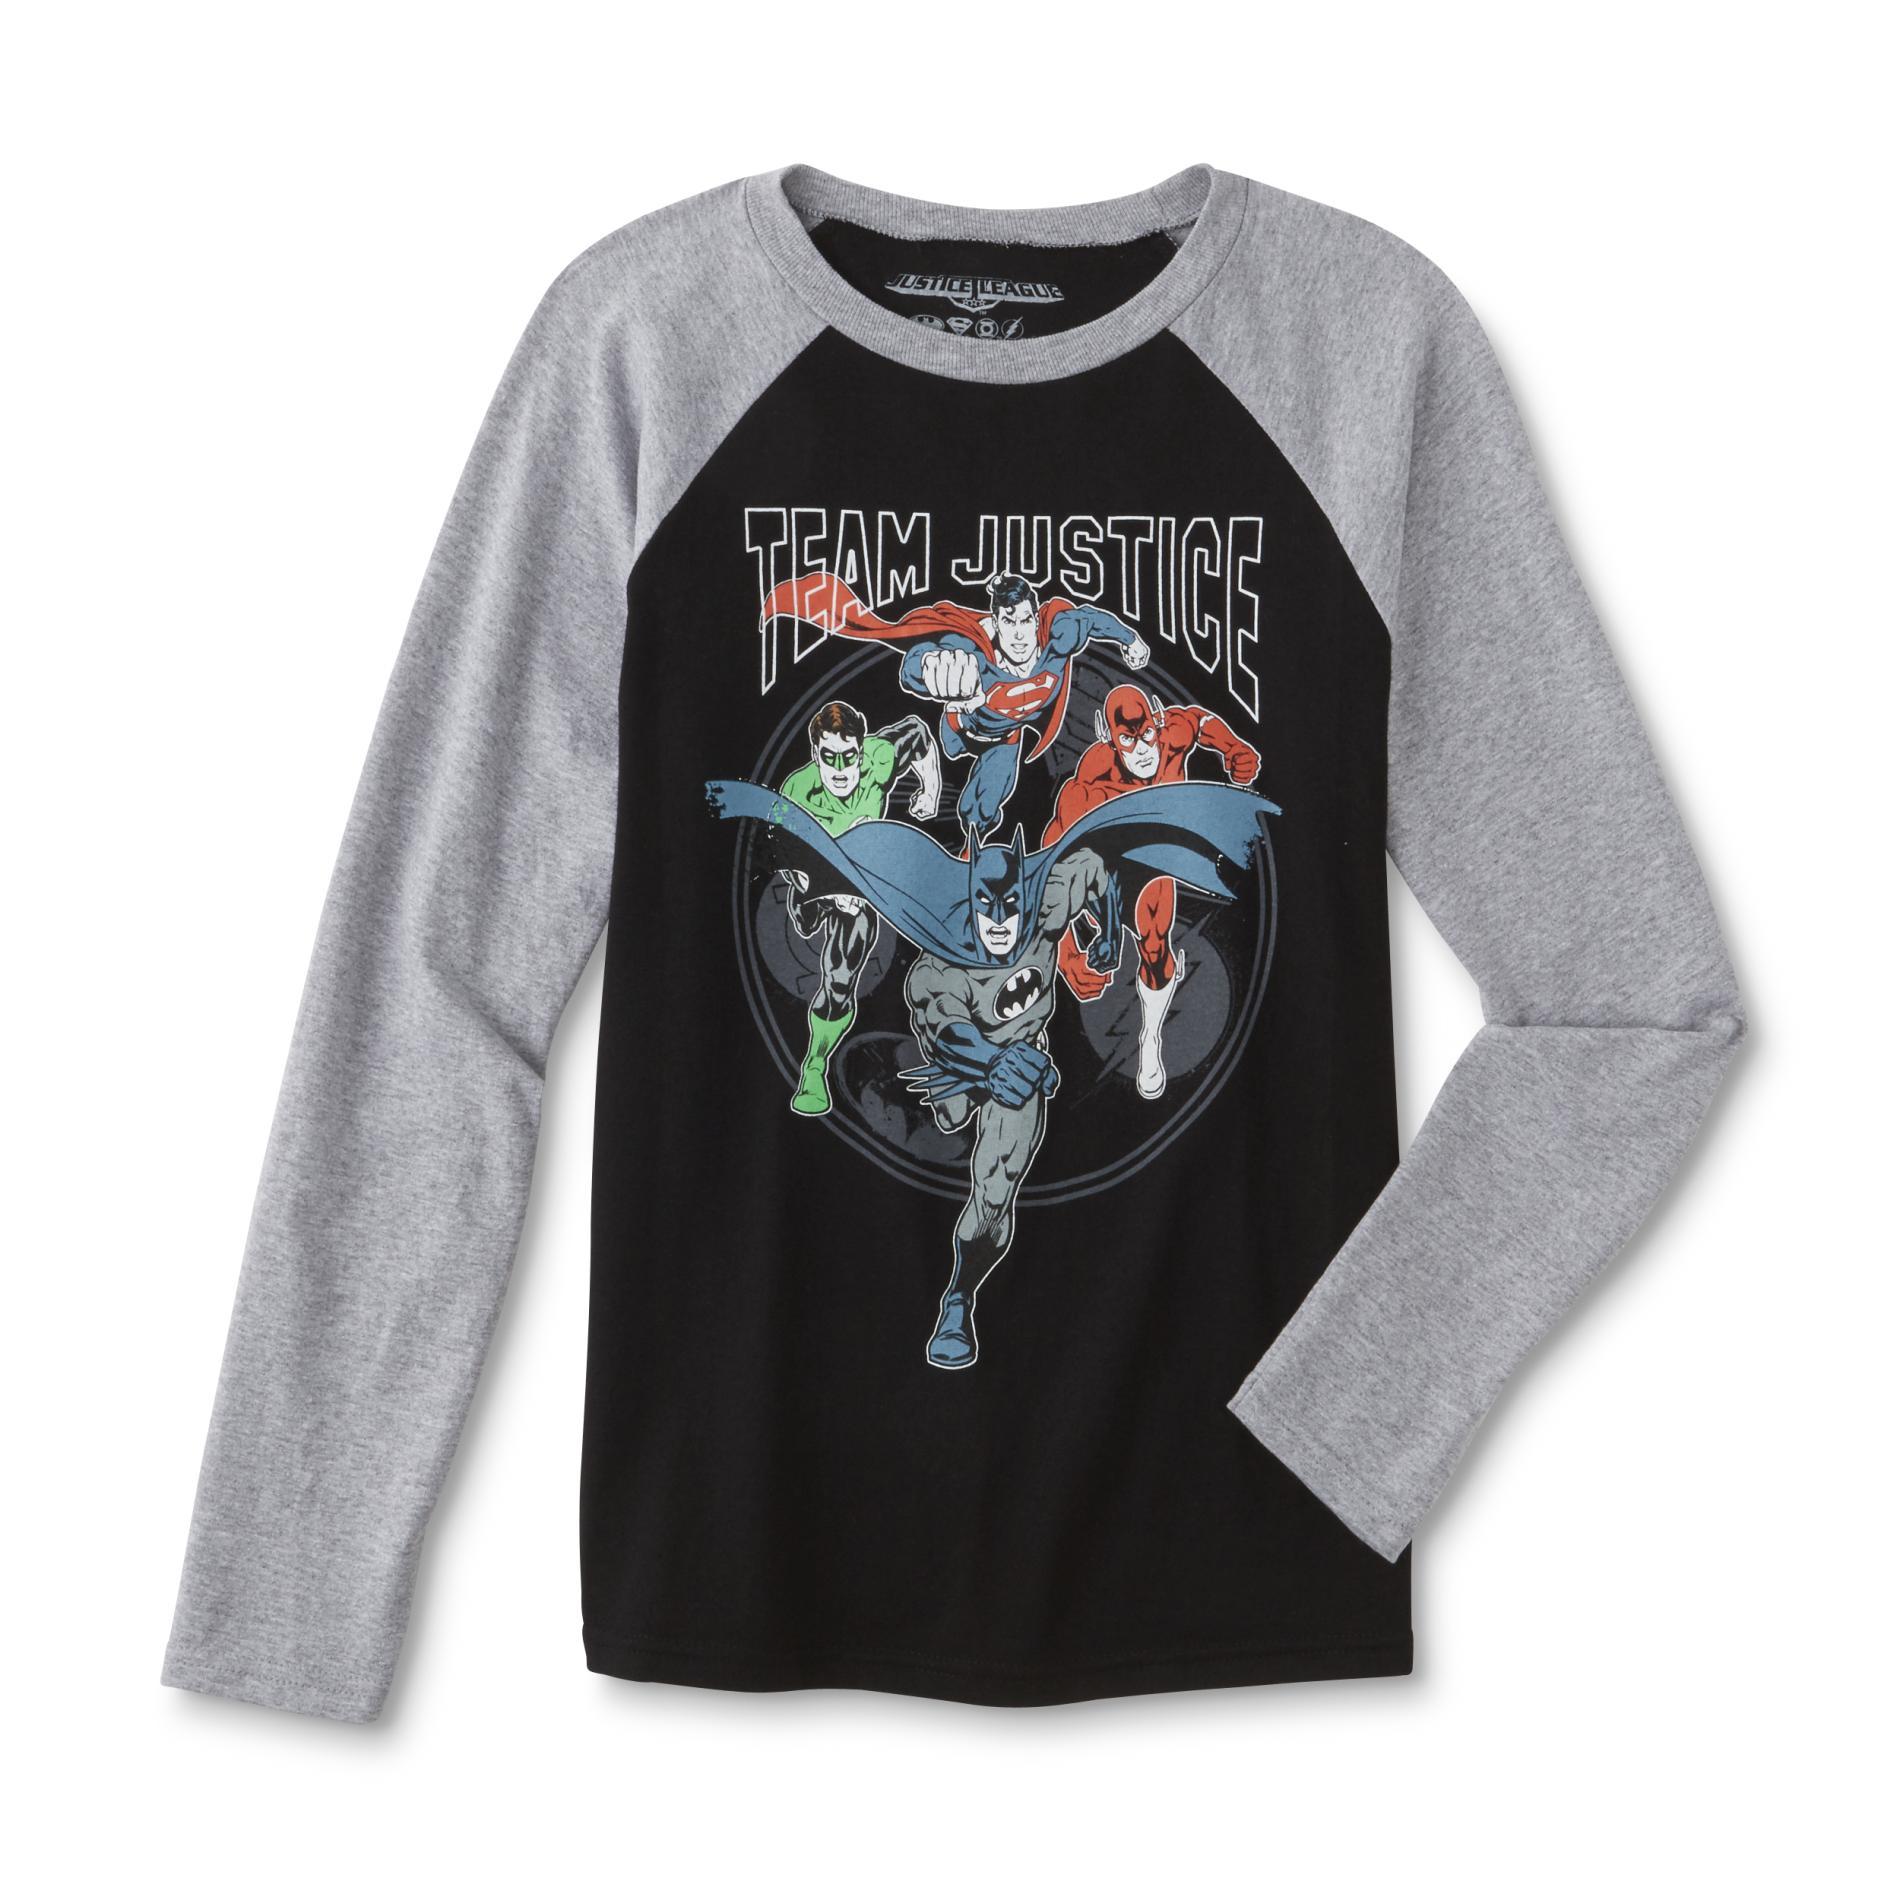 Justice League Boys' Graphic T-Shirt PartNumber: 040VA98679612P MfgPartNumber: RG556KJLA